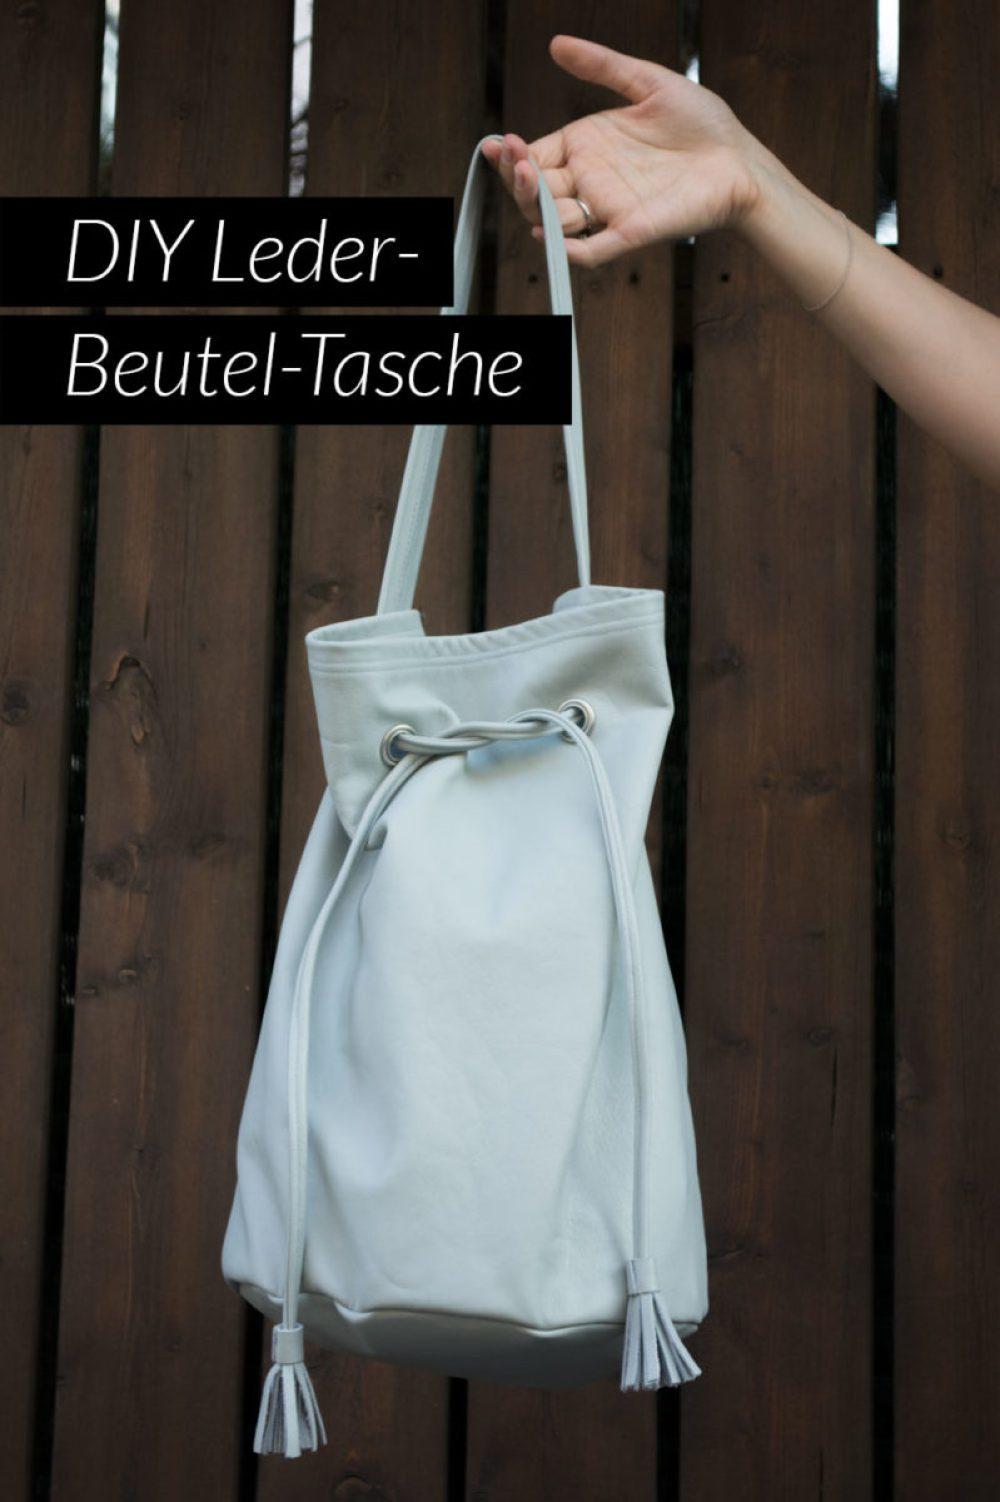 yellowgirl_DIY_Leder_Beutel_Tasche_3